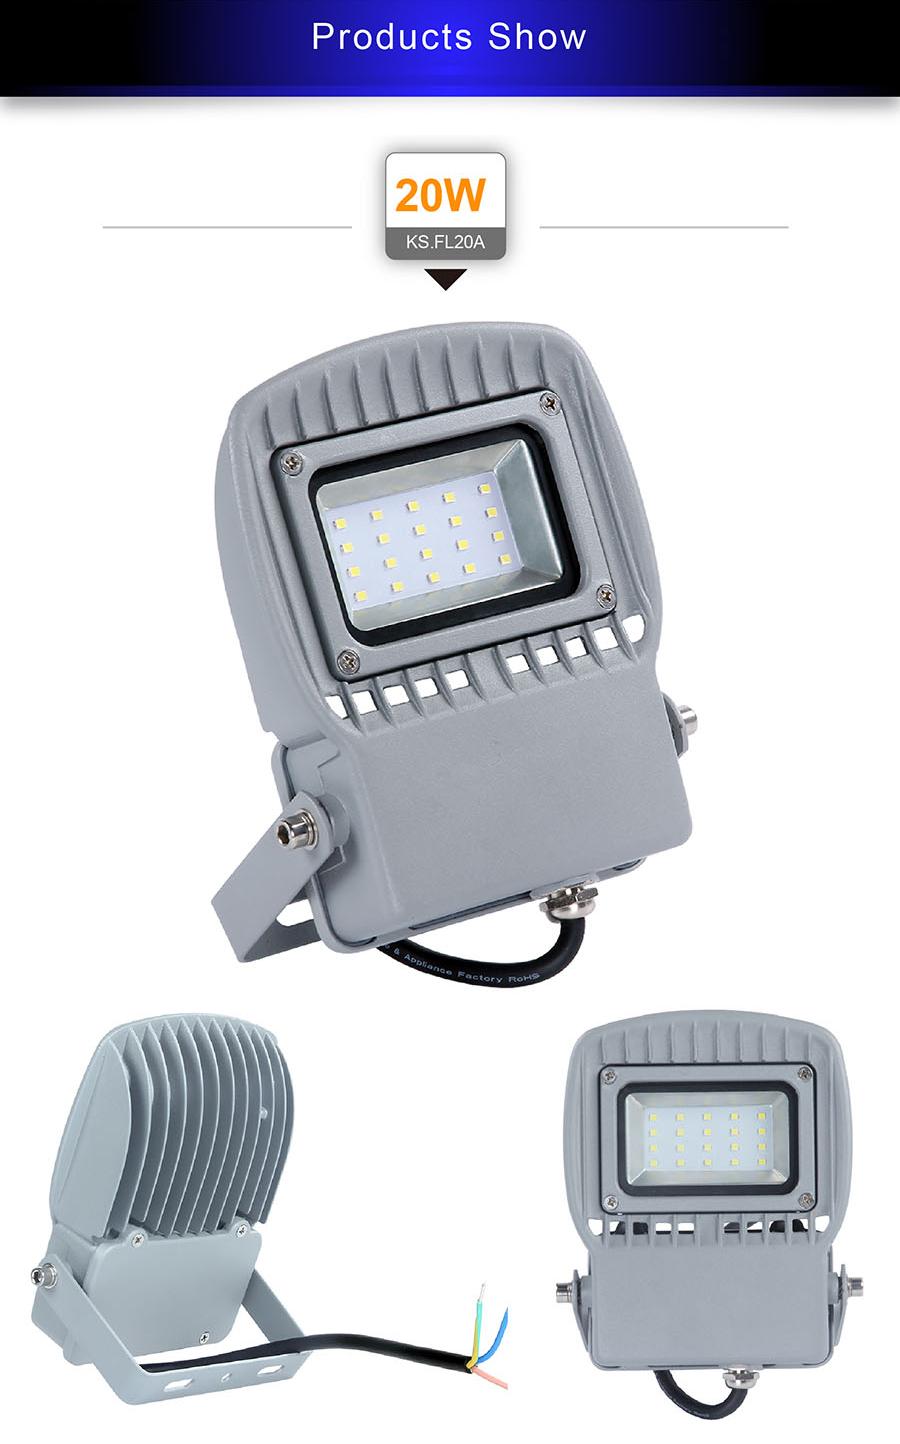 LED Flood Light - A Series 4